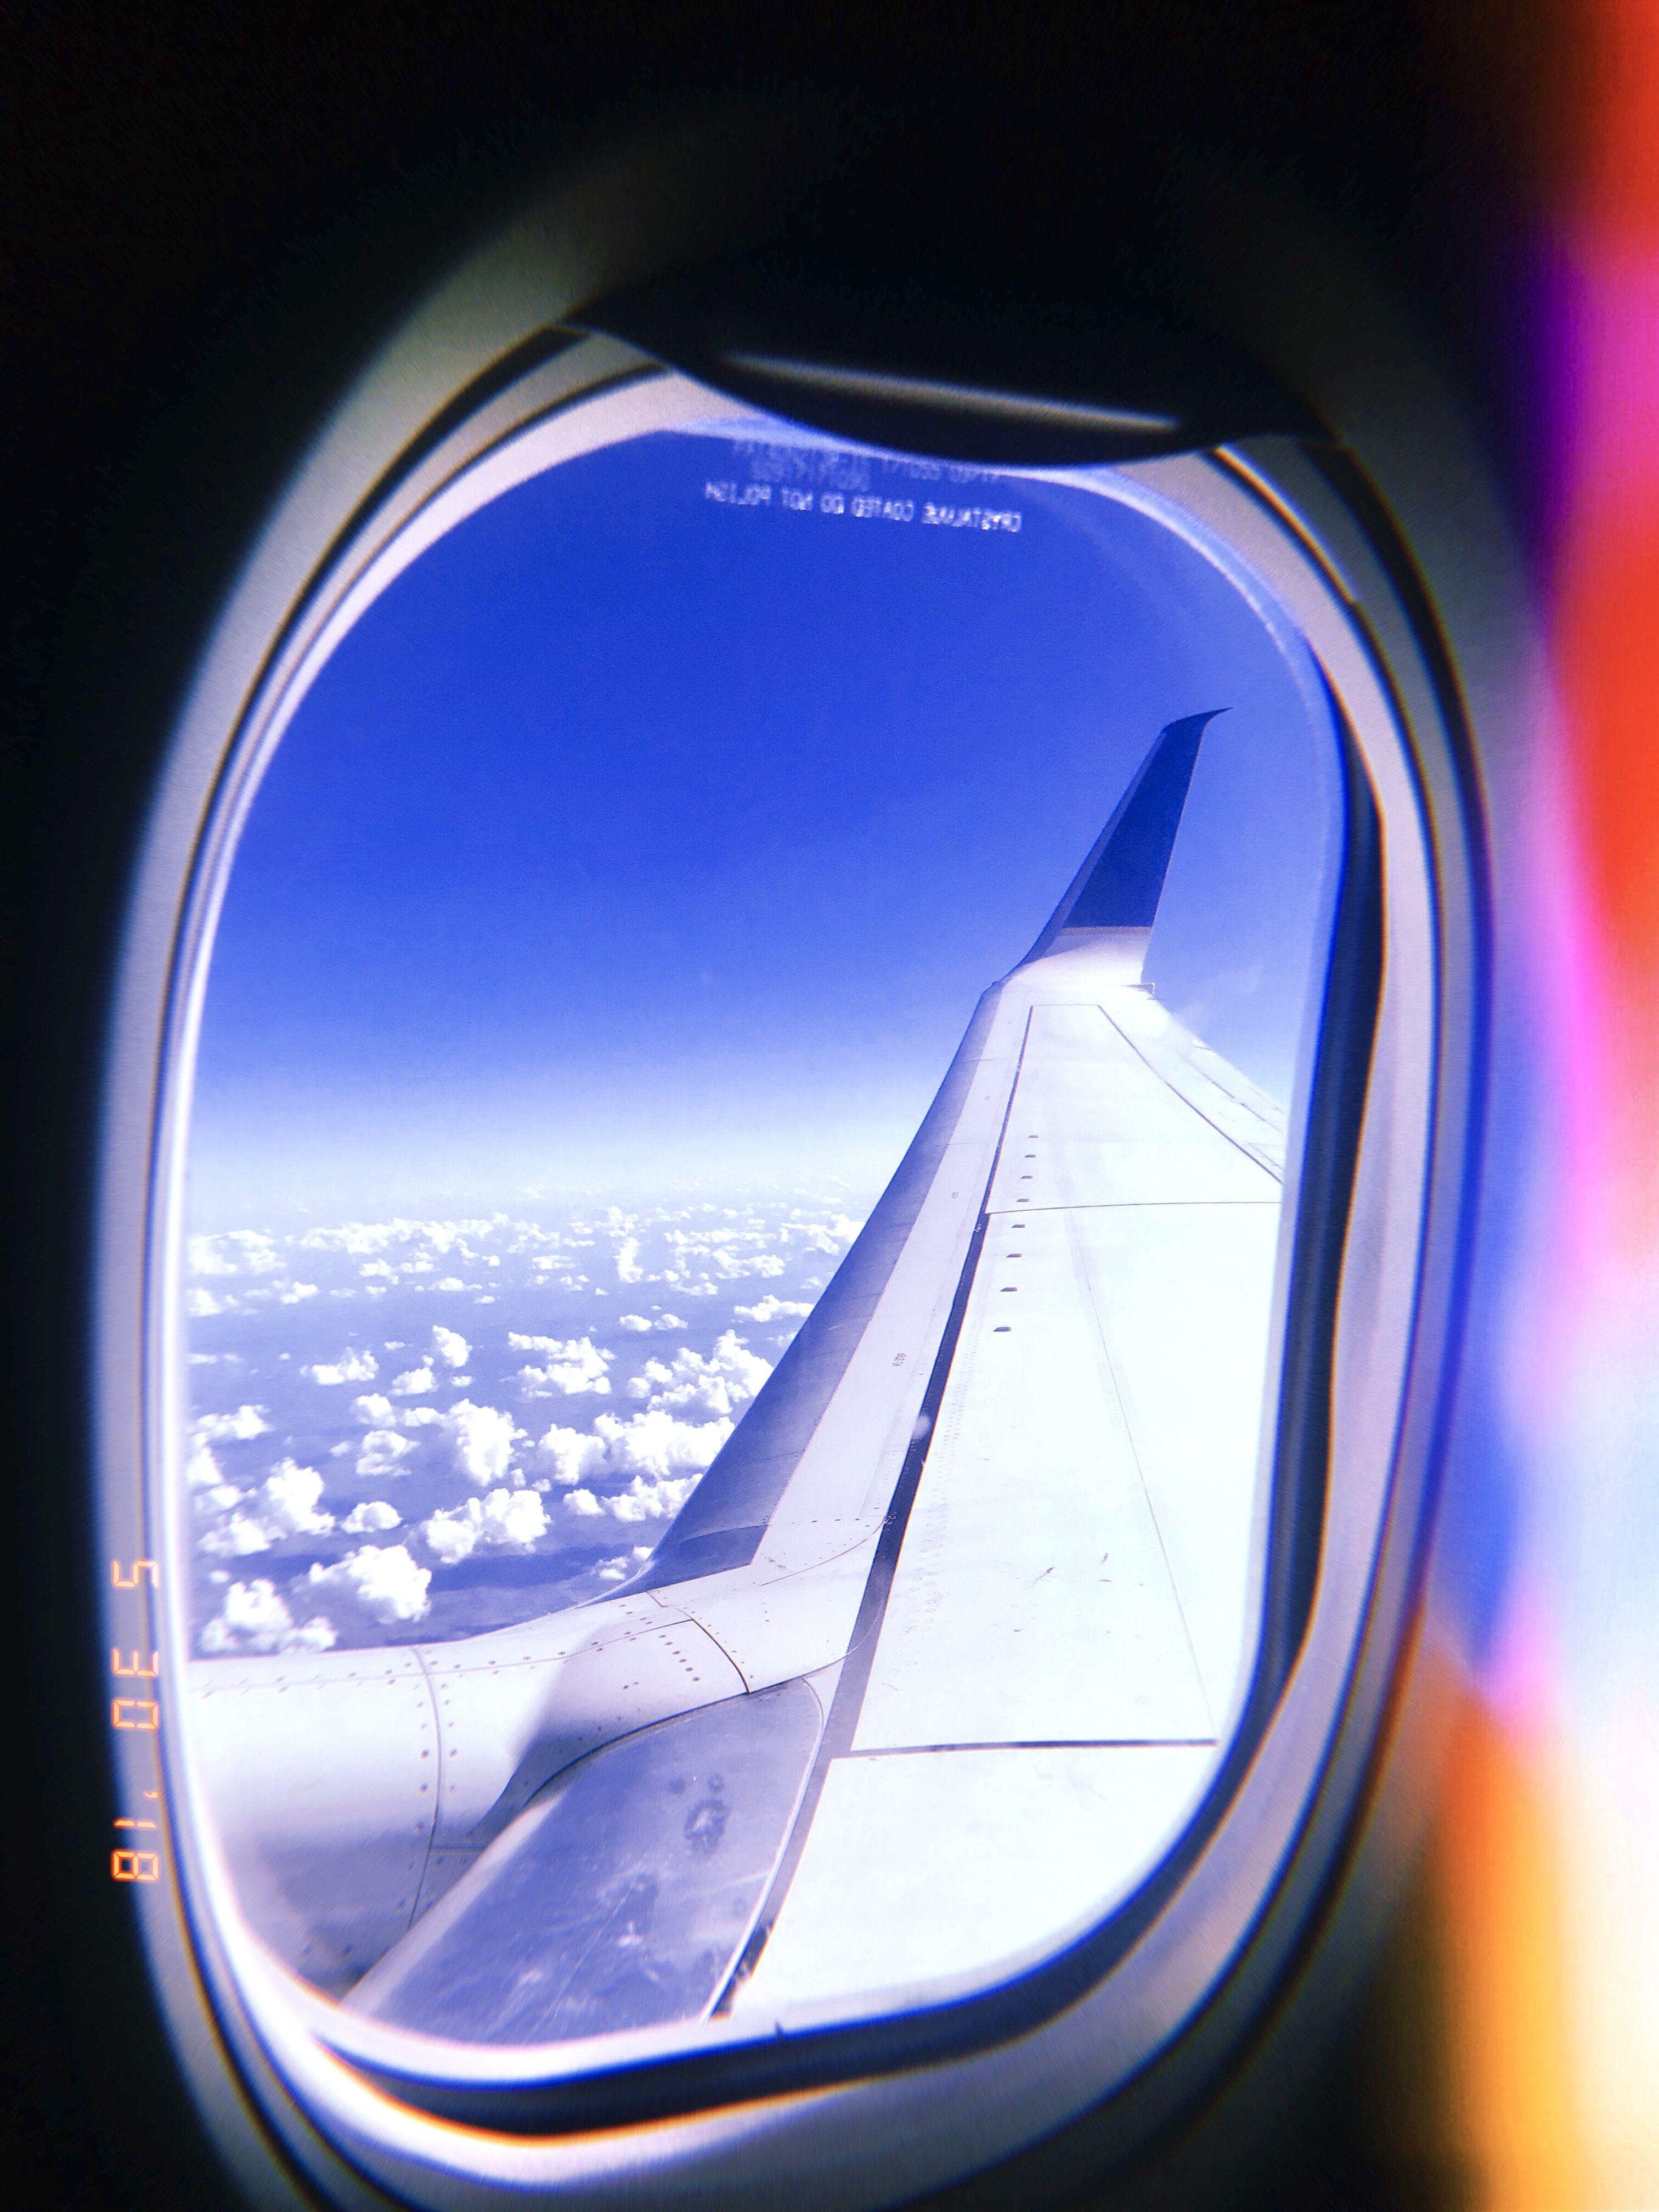 artsy airplane window aesthetic